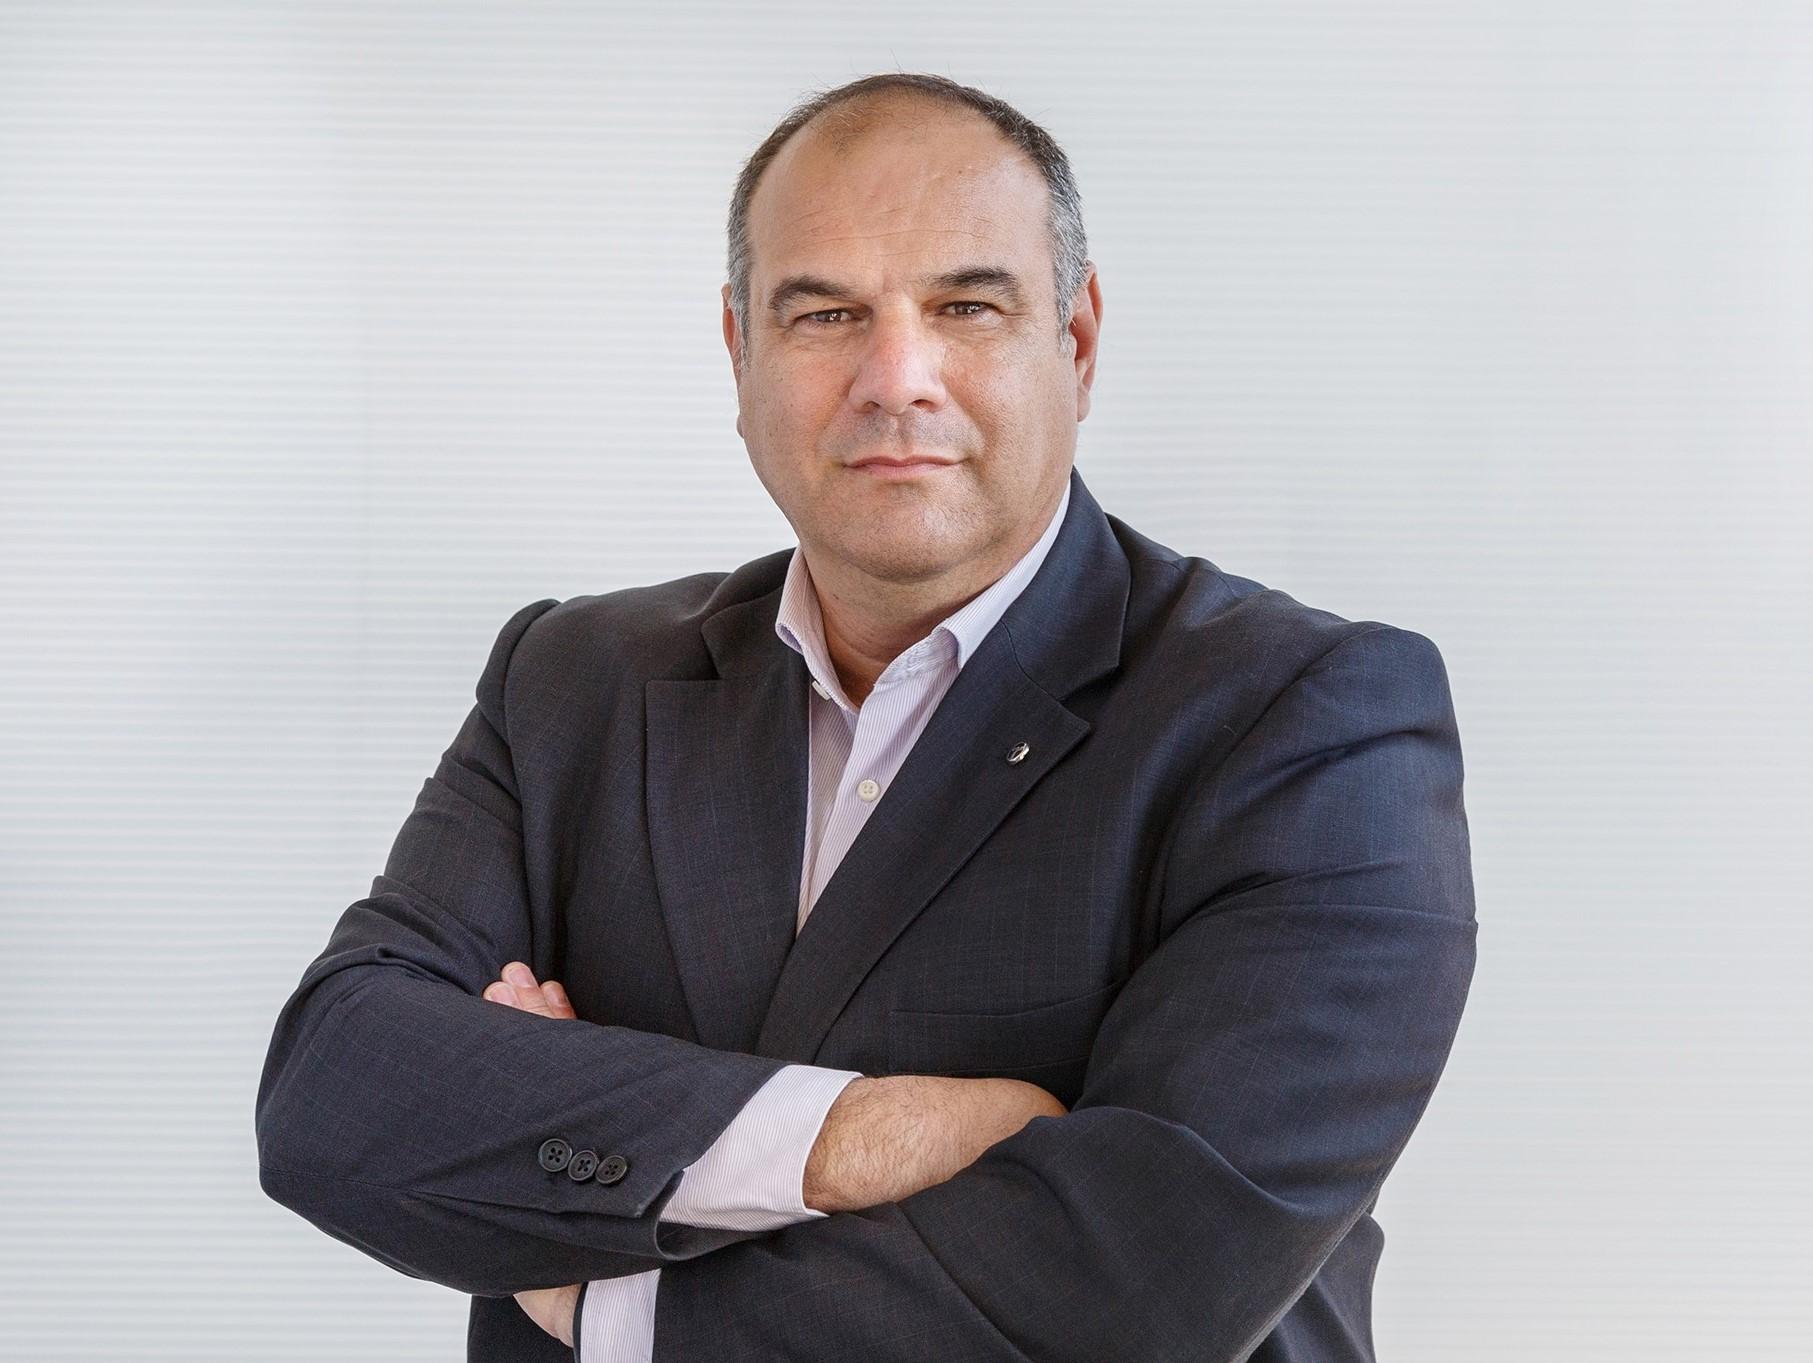 Antonio Jesús López